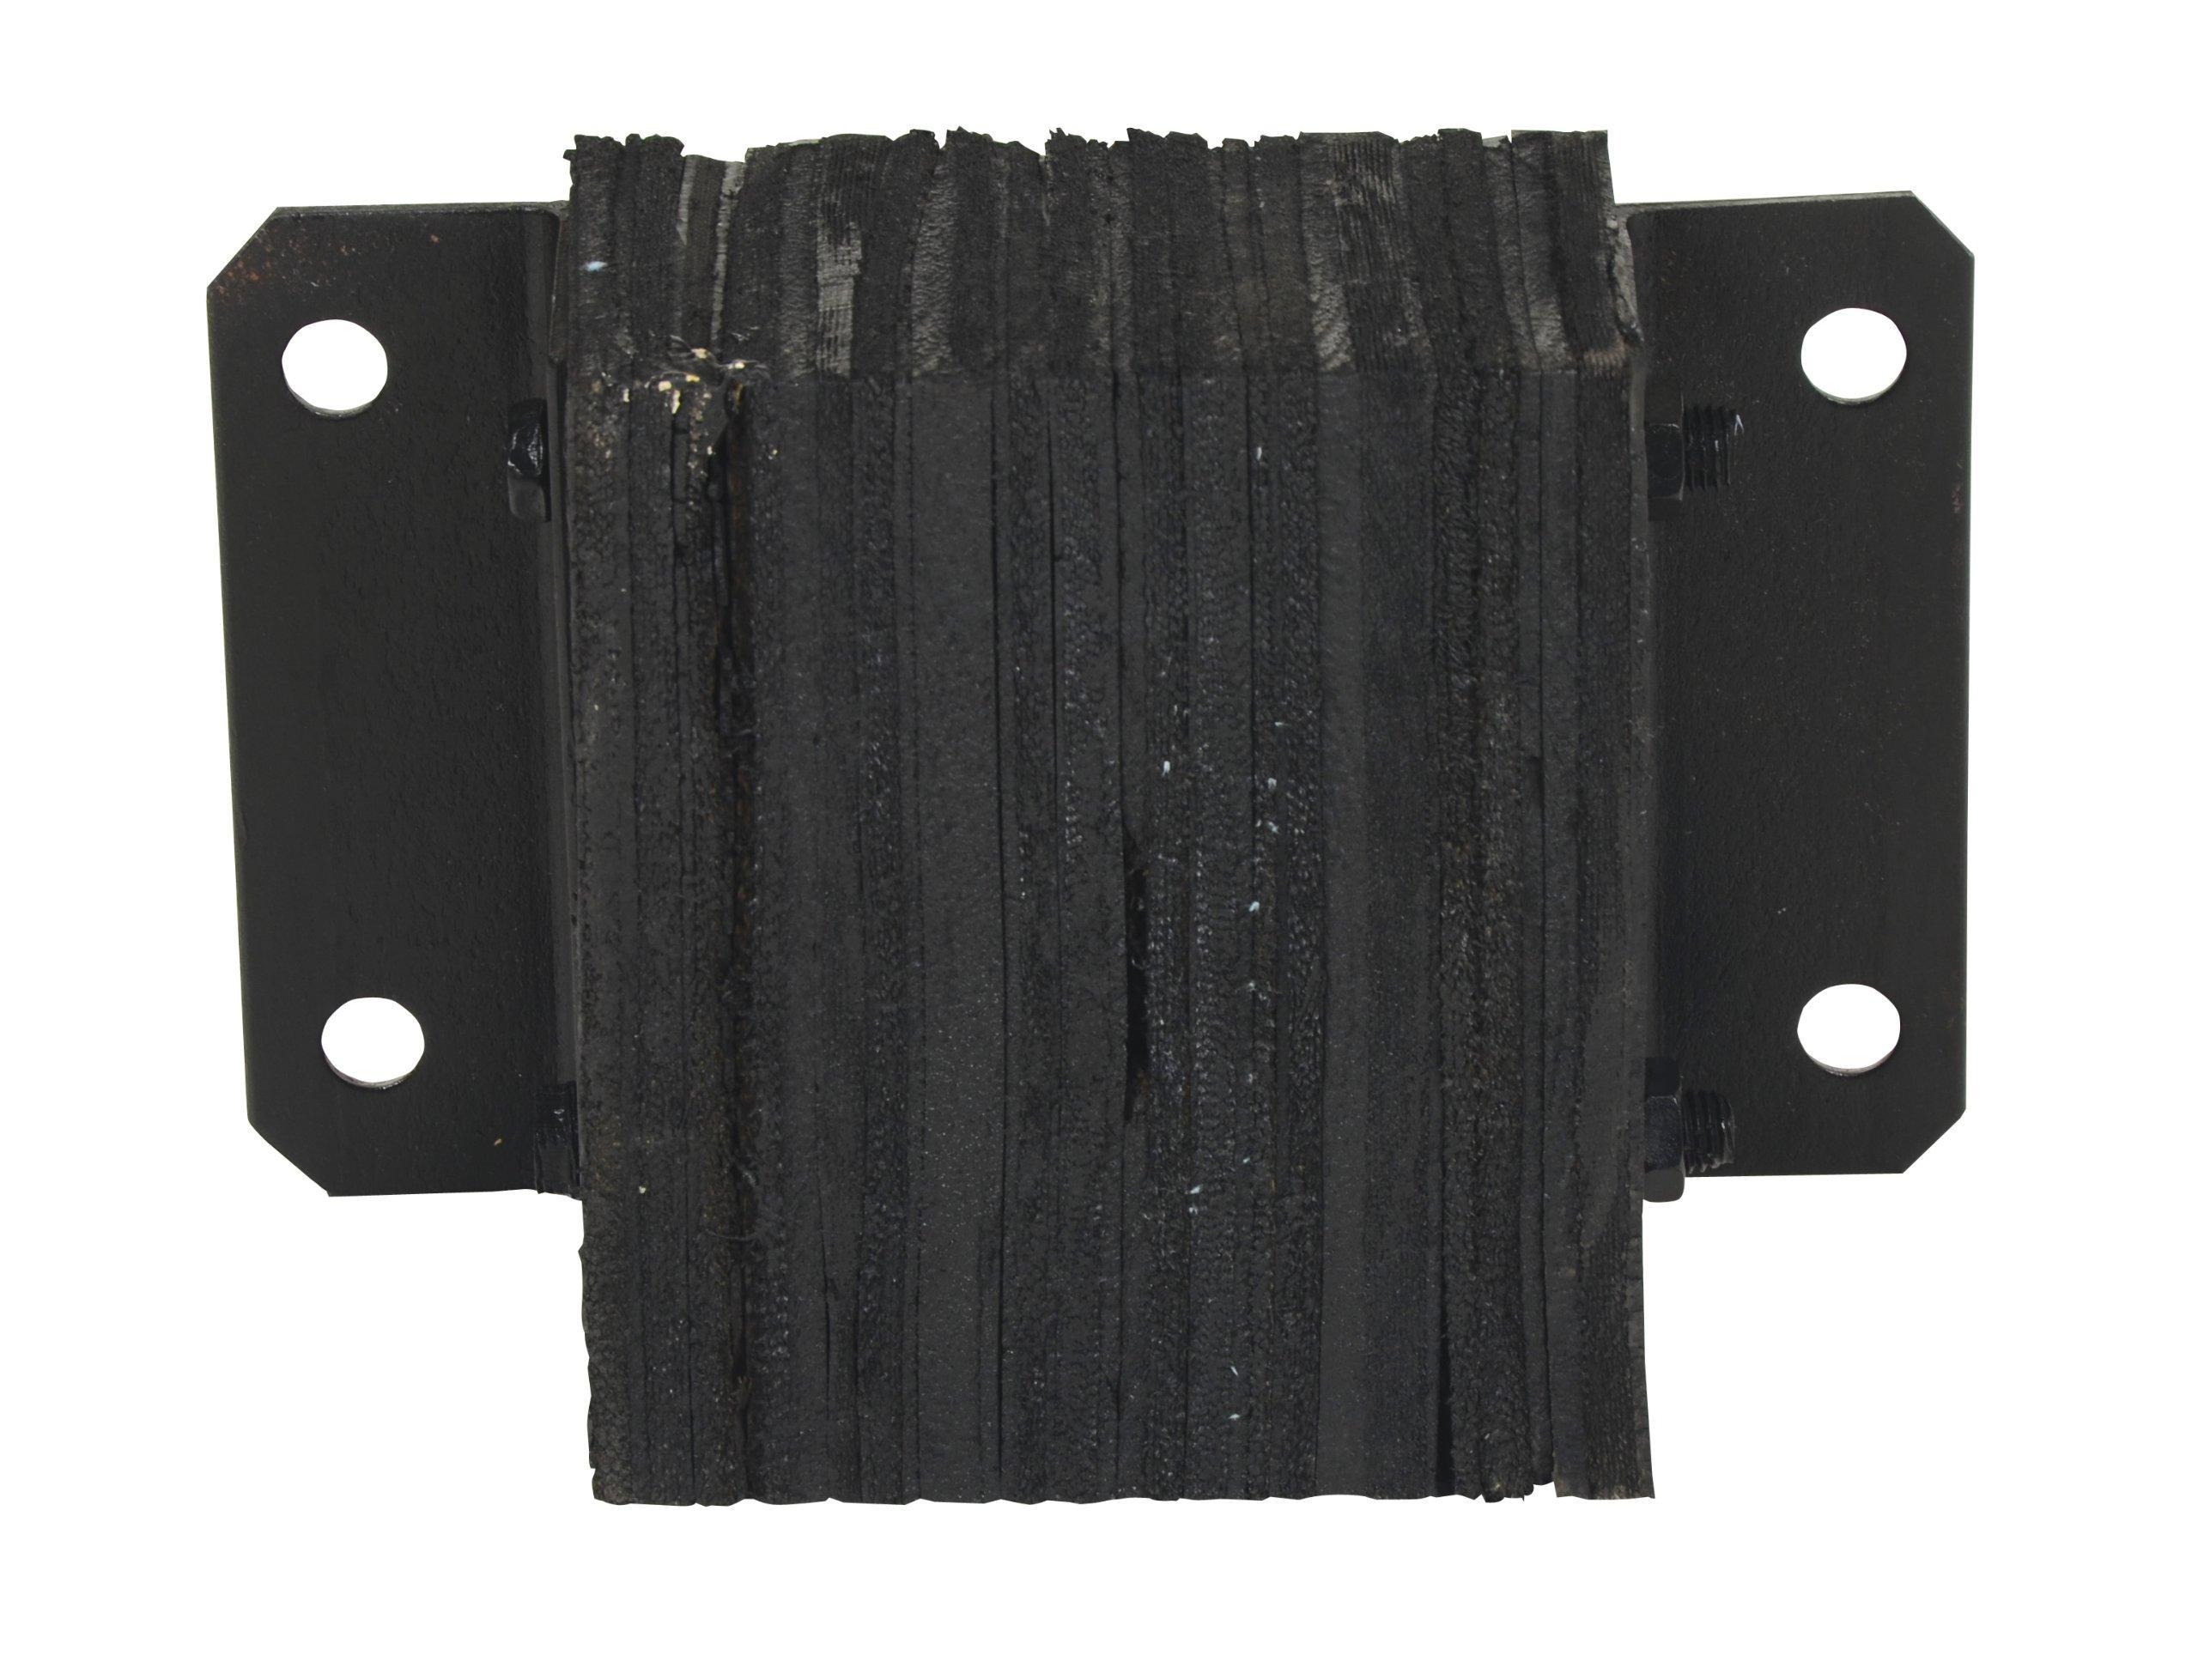 Vestil 1012-4.5 Horizontal Laminated Dock Bumper, Fabric Reinforced Rubber, Rectangular, 4 Holes, 10'' Height, 12'' Width, 4-1/2'' Depth